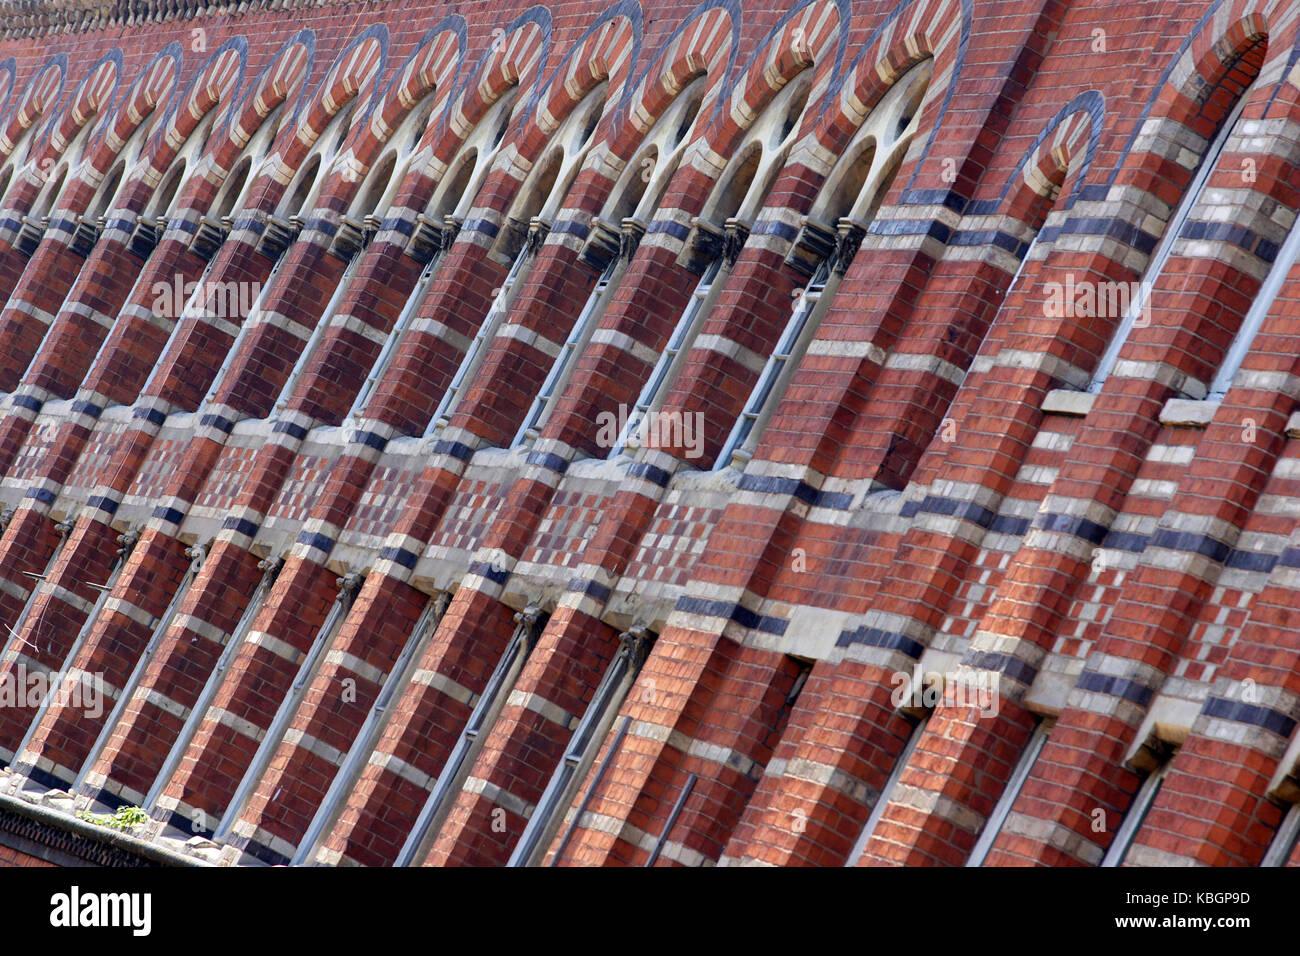 Colourful victorian brickwork in Hockley, Birmingham. - Stock Image